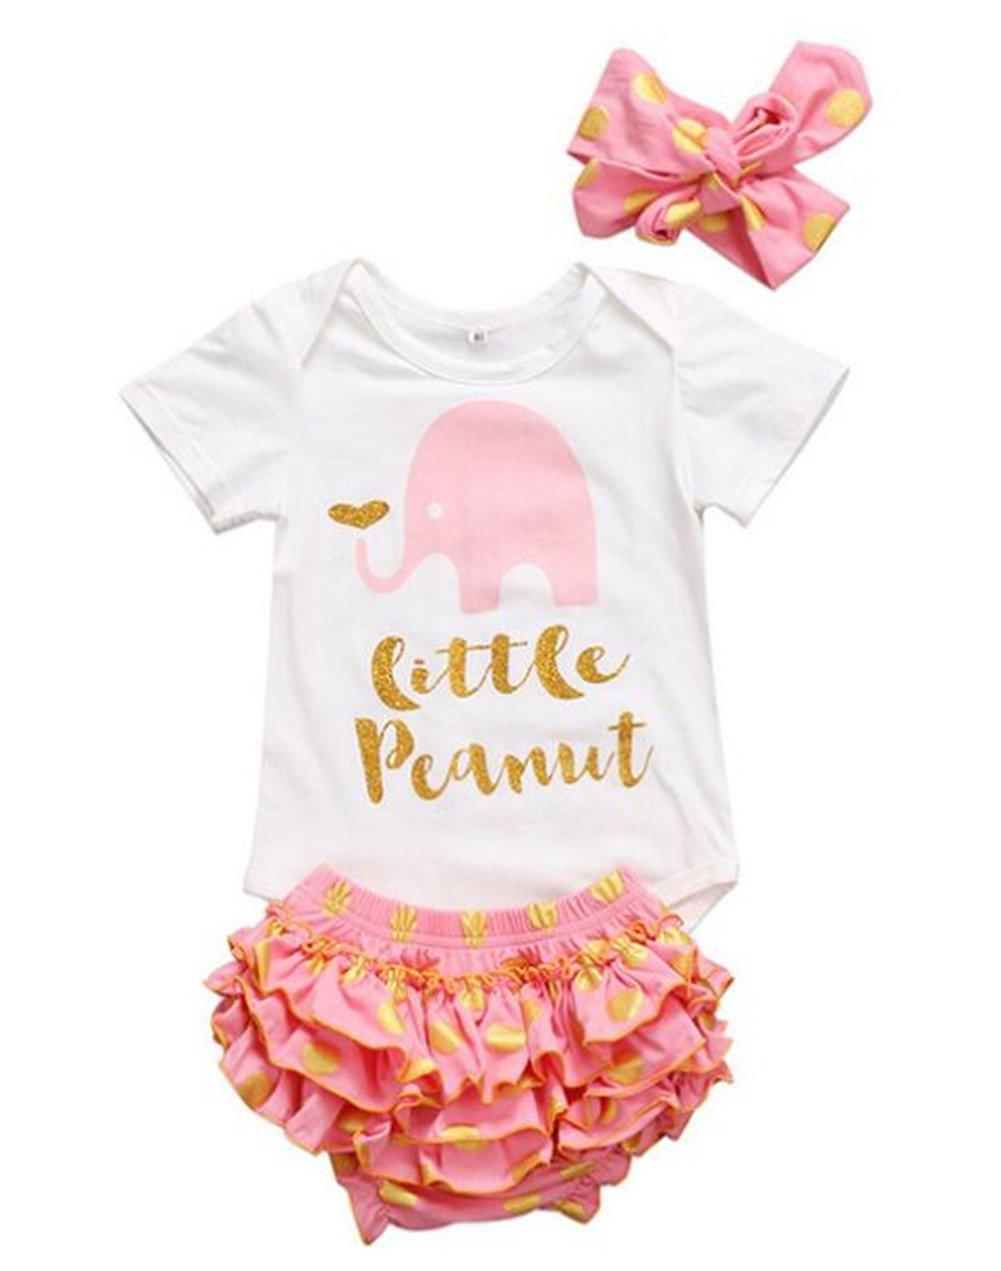 Baby Girl Elephant Letters Romper +Polka Dot Ruffle Skirts Shorts+Headband Set BANGELY J090